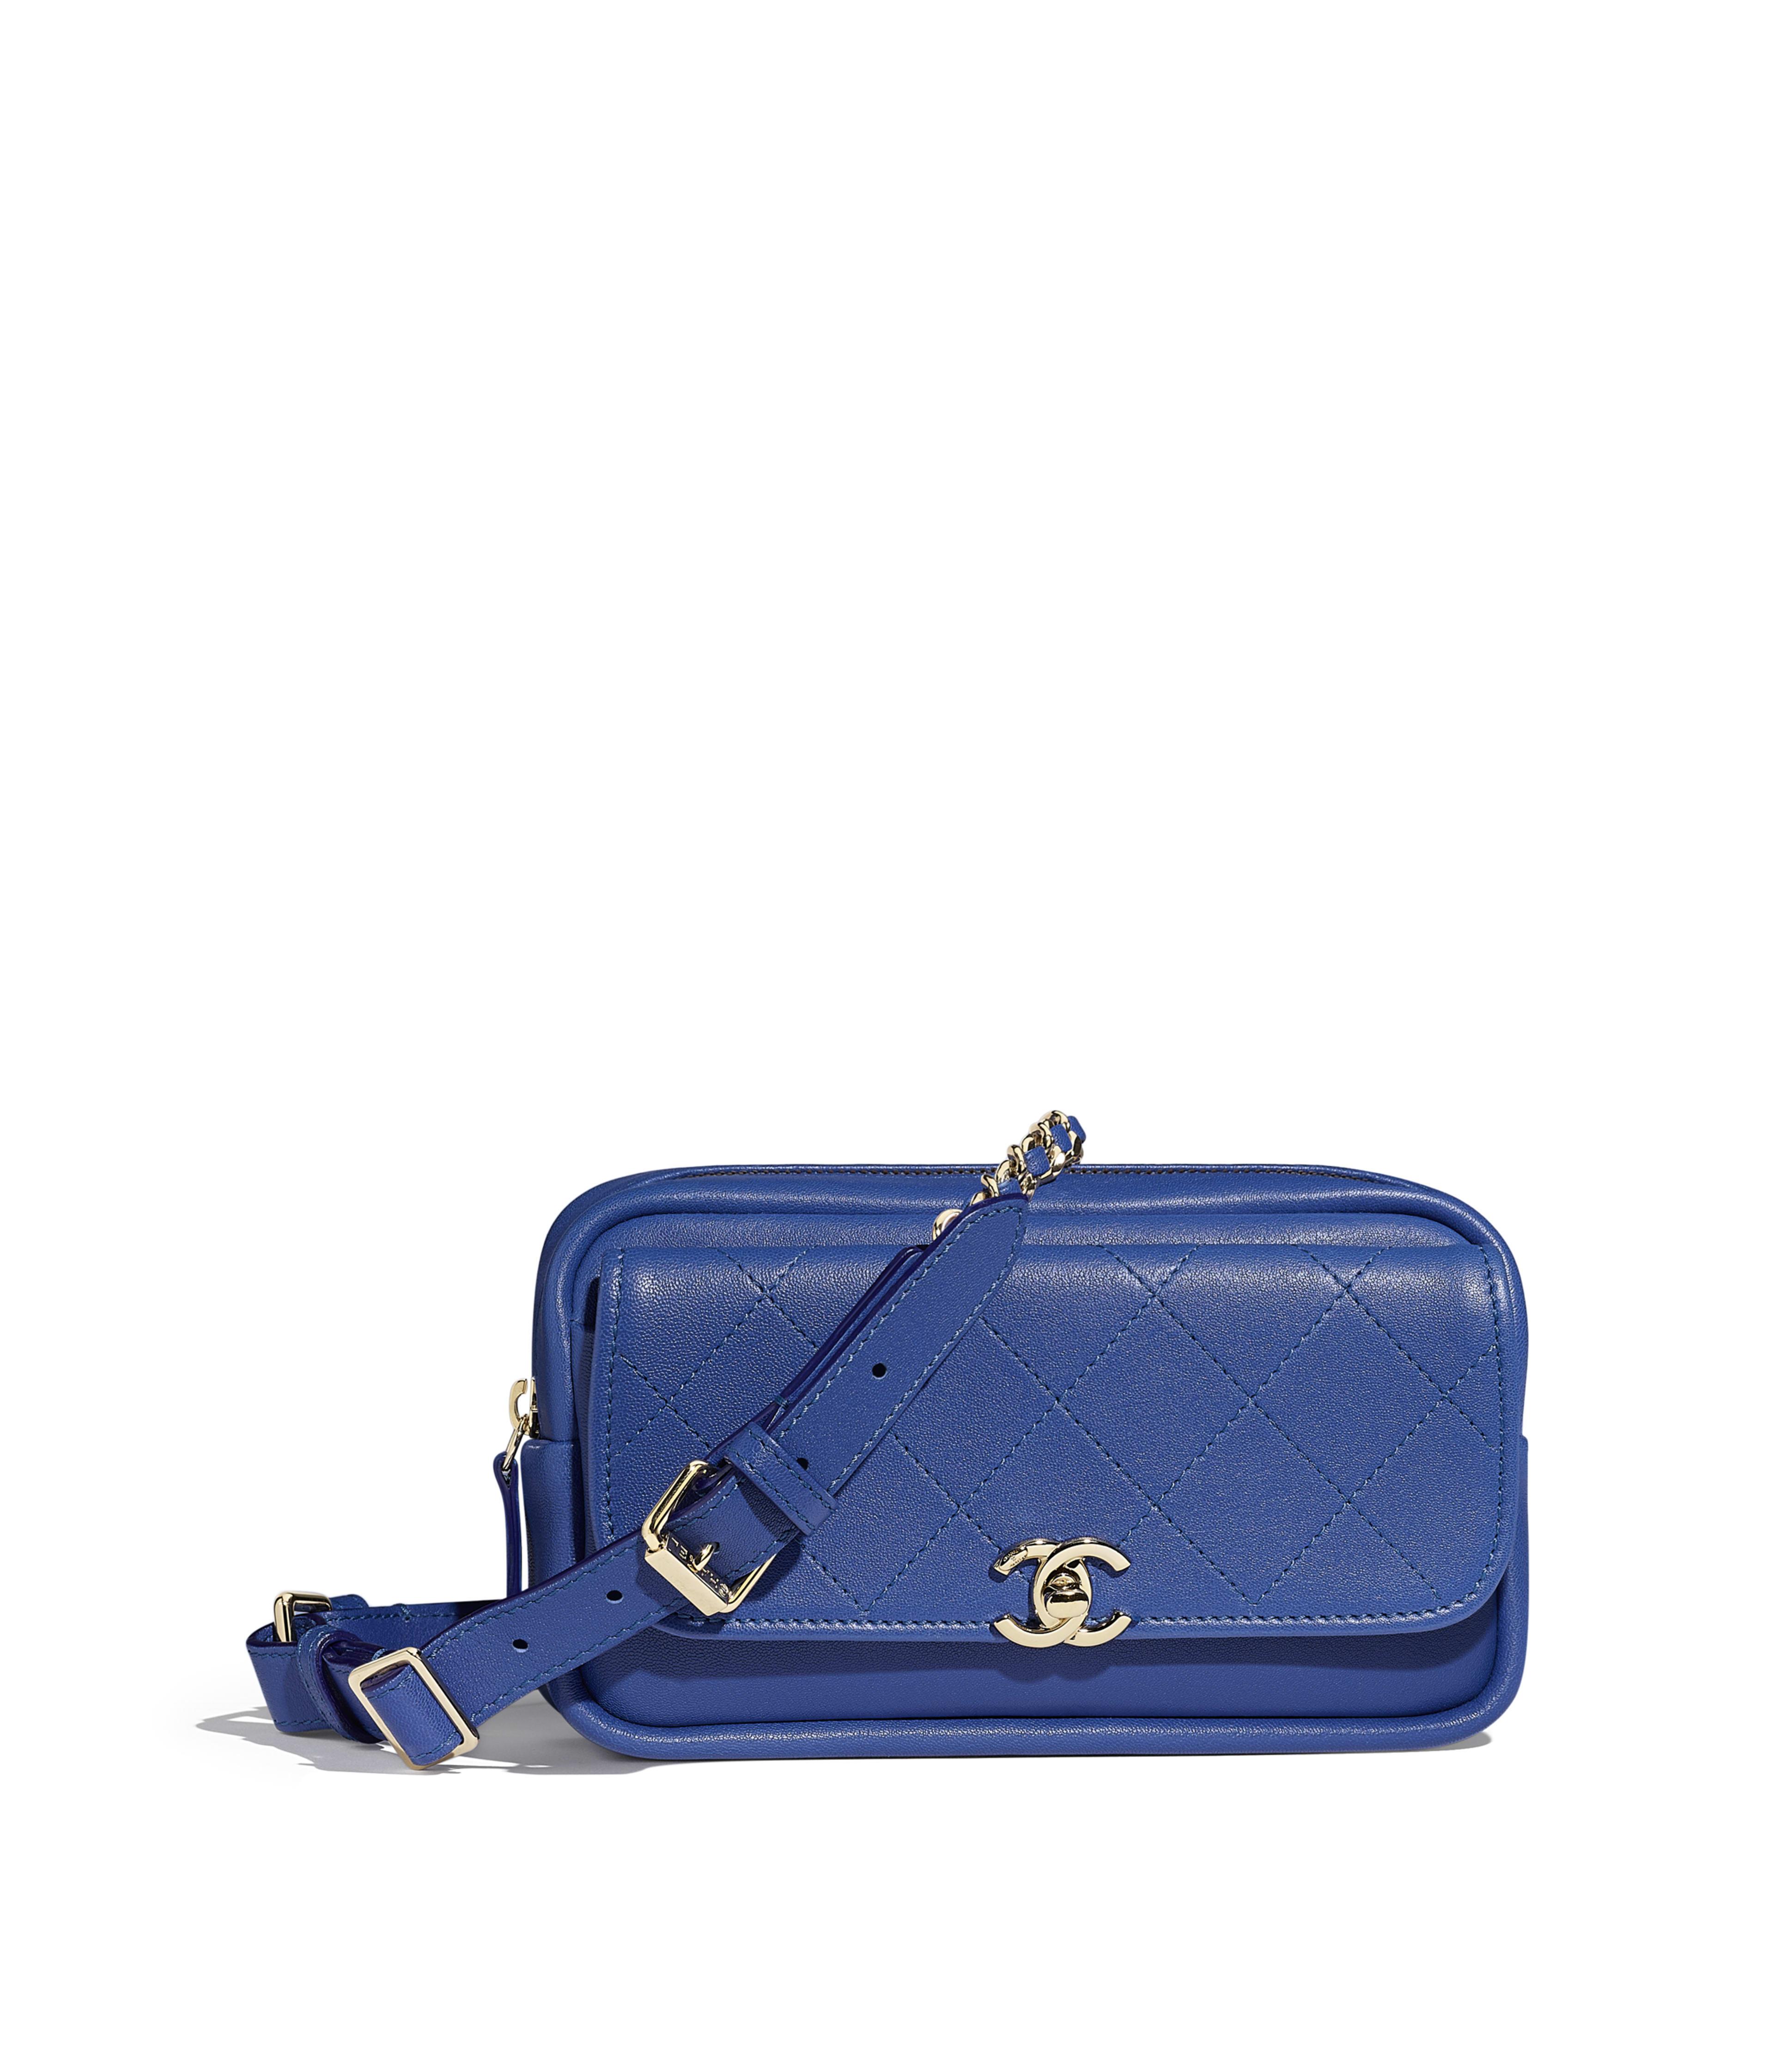 e09416c6d988 Waist Bag Lambskin & Gold-Tone Metal, Dark Blue Ref. AS0142Y841575B645